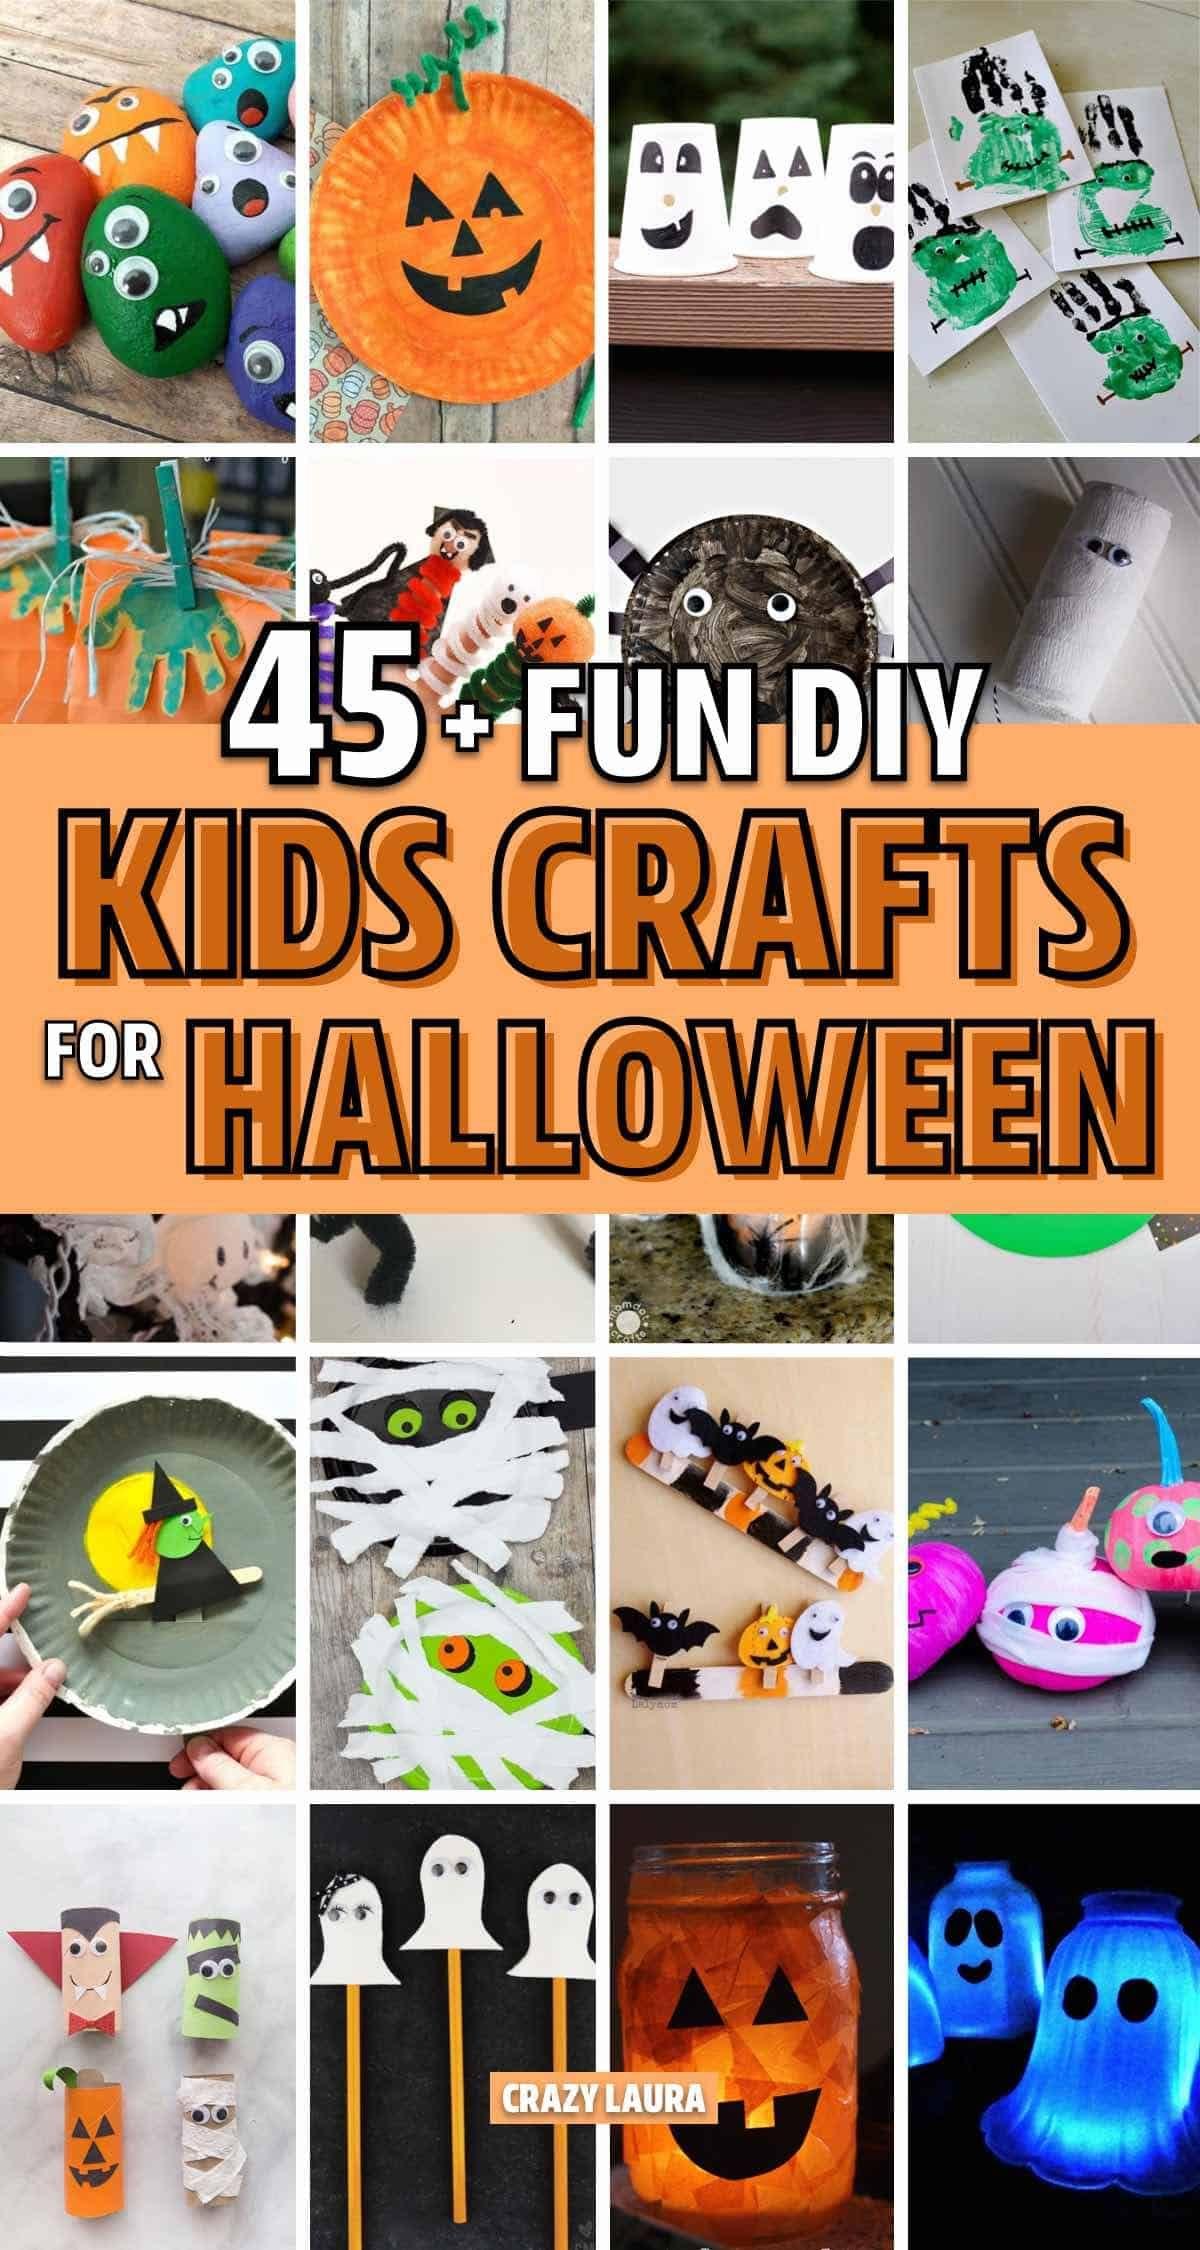 2020 Halloween Crafts 45+ Best Halloween Crafts For Kids In 2020   Crazy Laura